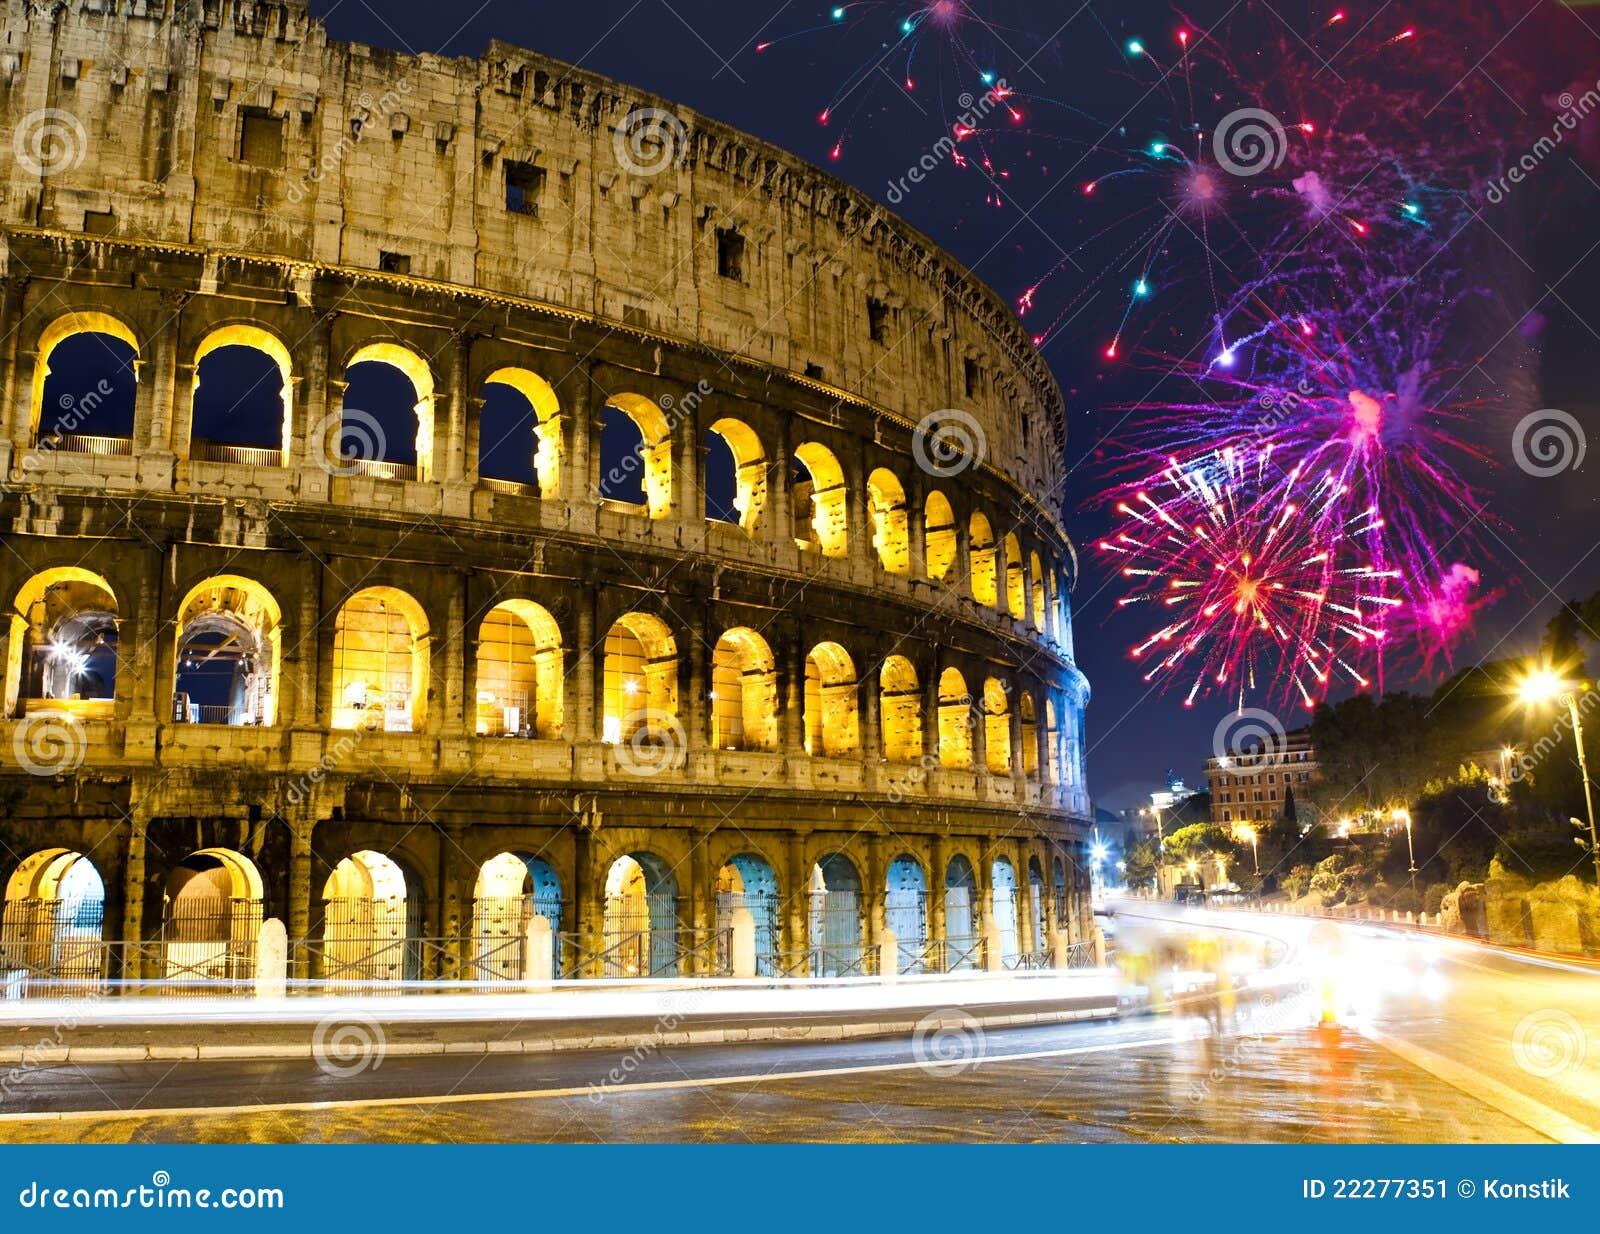 Celebratory collosseofyrverkerier italy över rome